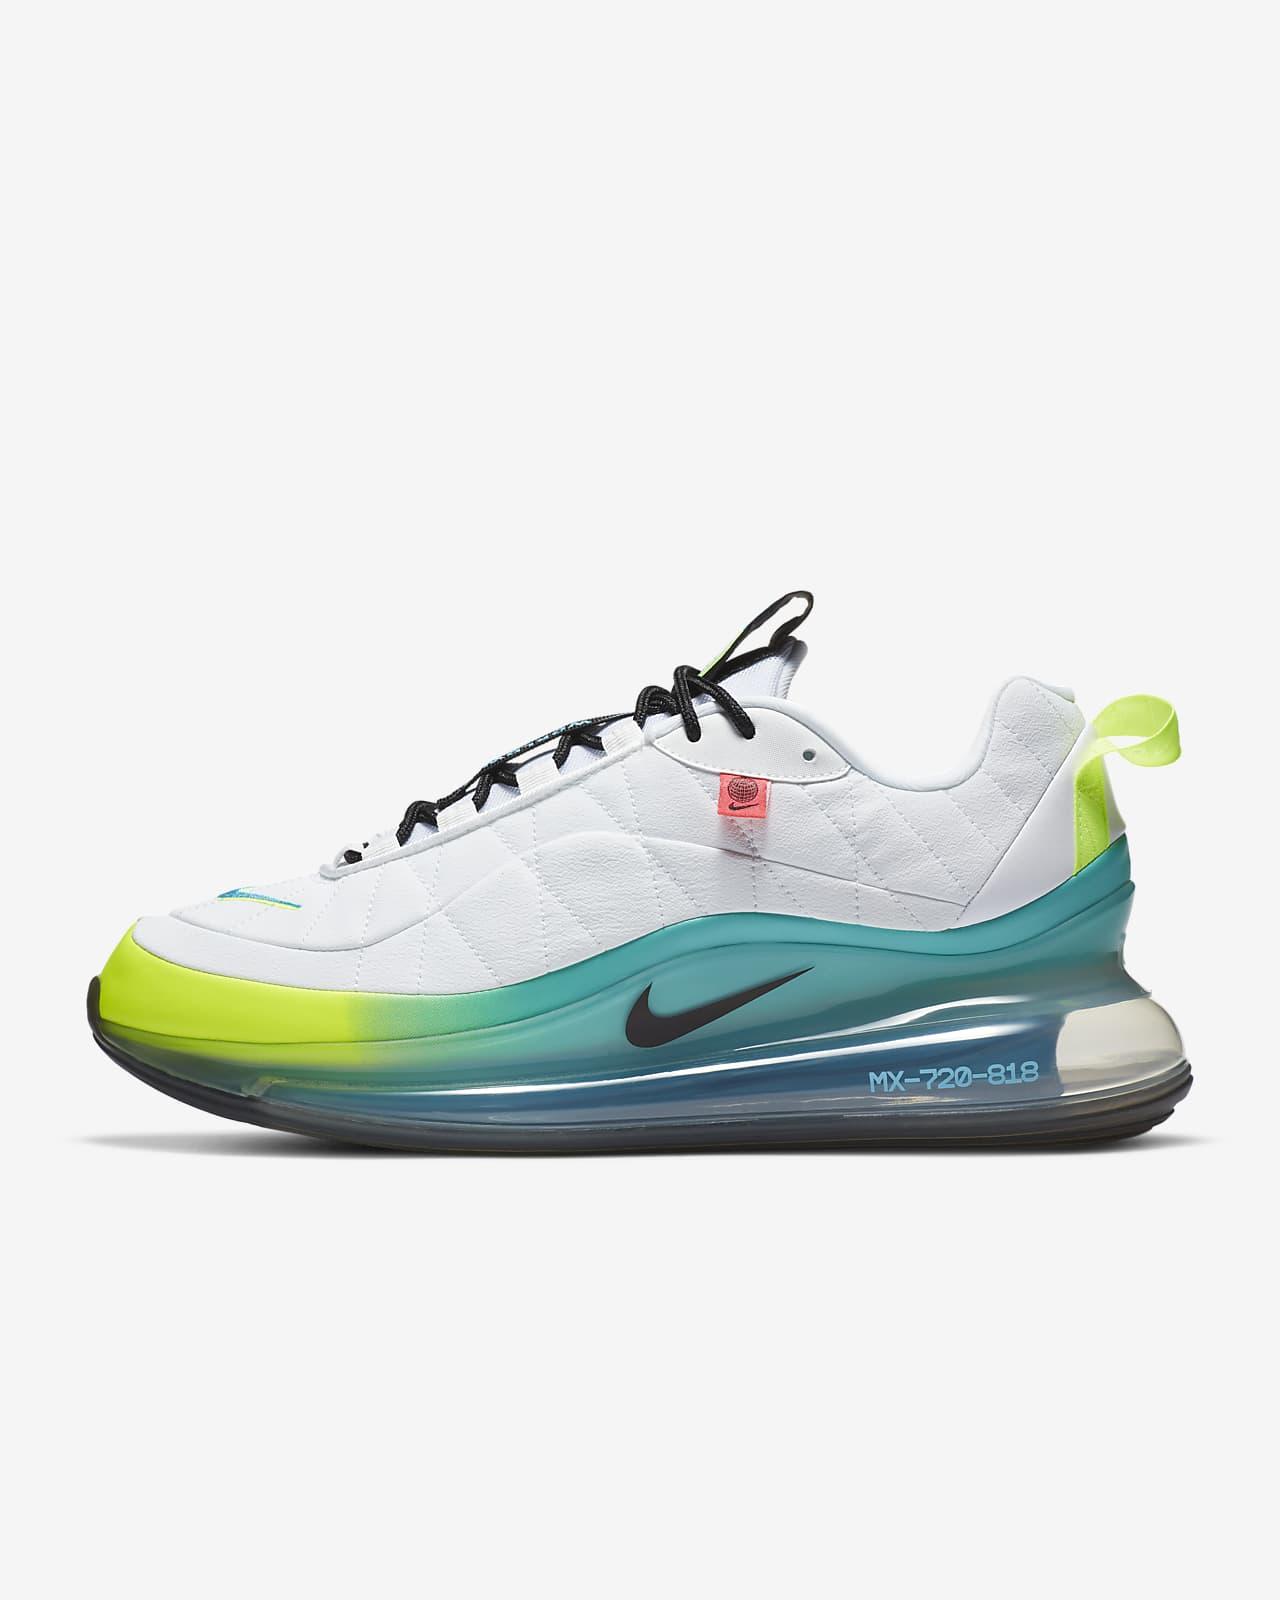 mimar Preocupado letal  Nike MX-720-818 Worldwide Men's Shoe. Nike LU